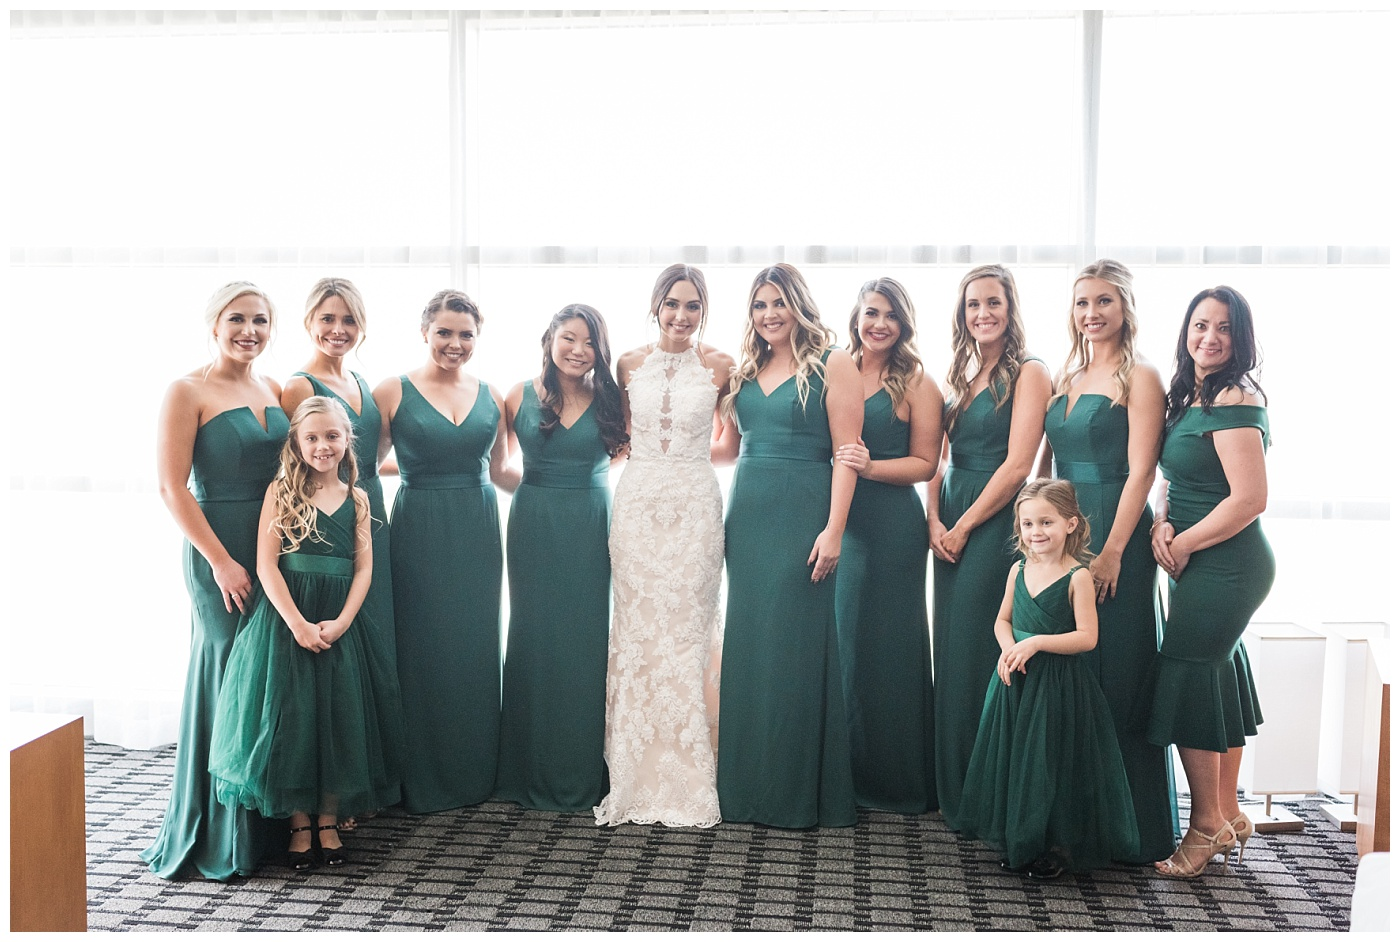 Stephanie Marie Photography Unitarian Universalist Society Church Ceremony Hotel Kirkwood Reception Cedar Rapids Iowa City Wedding Photographer Sean Madison Moore_0017.jpg